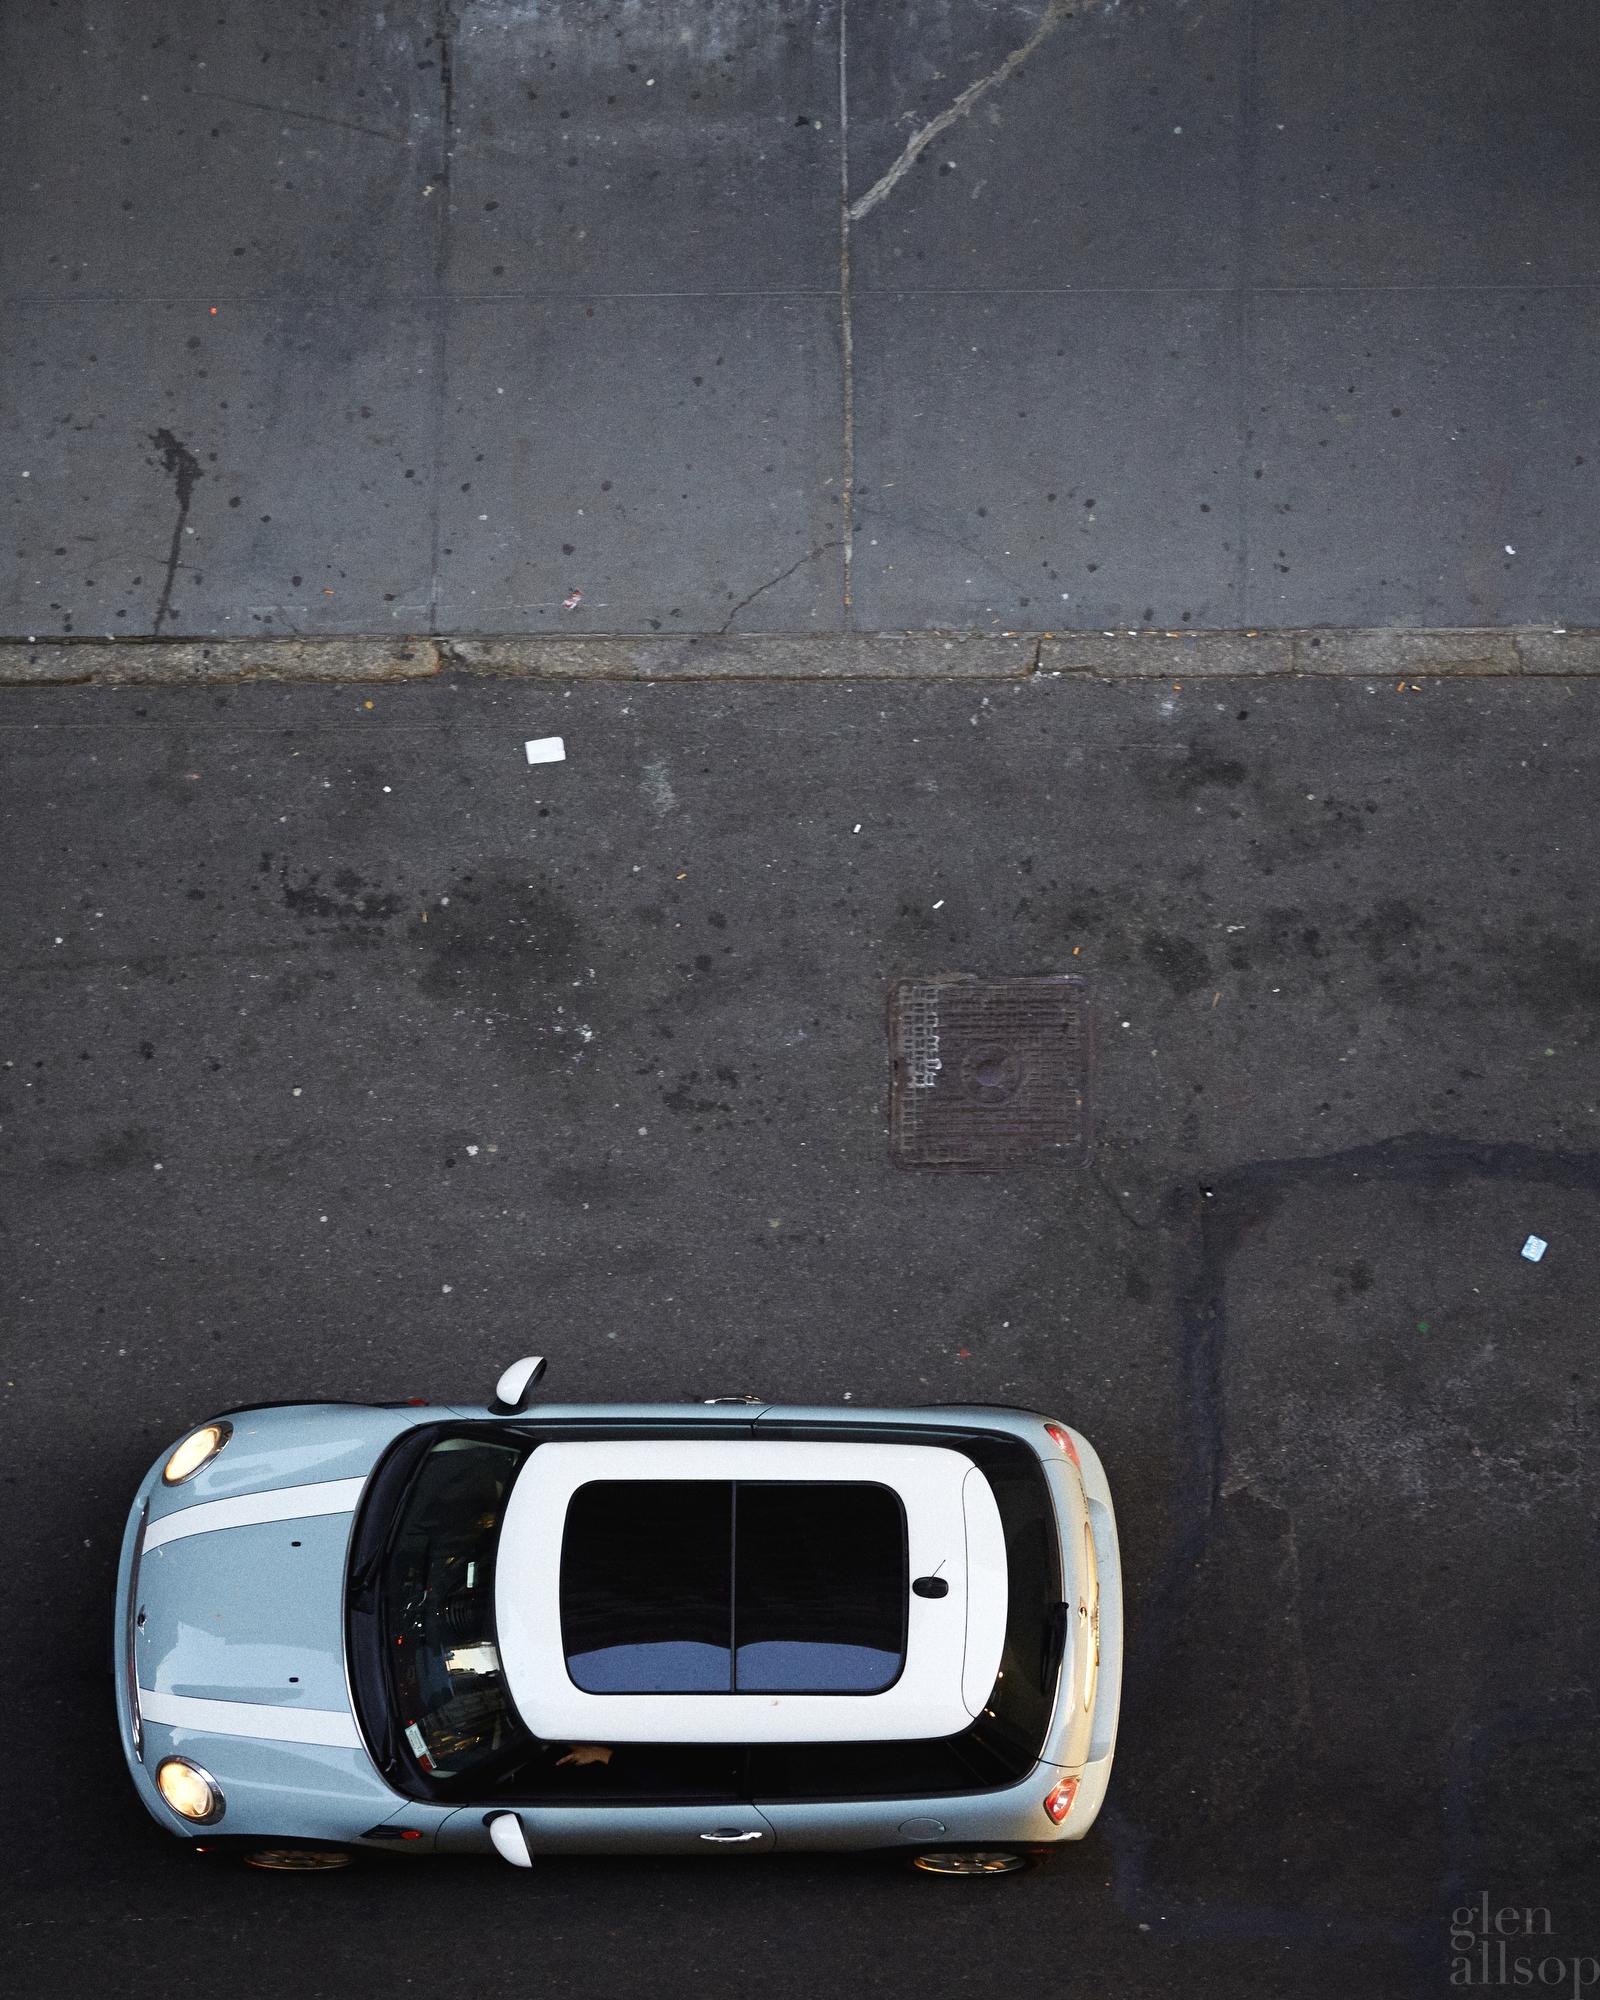 mini-new york-mini roof-bmw-teal